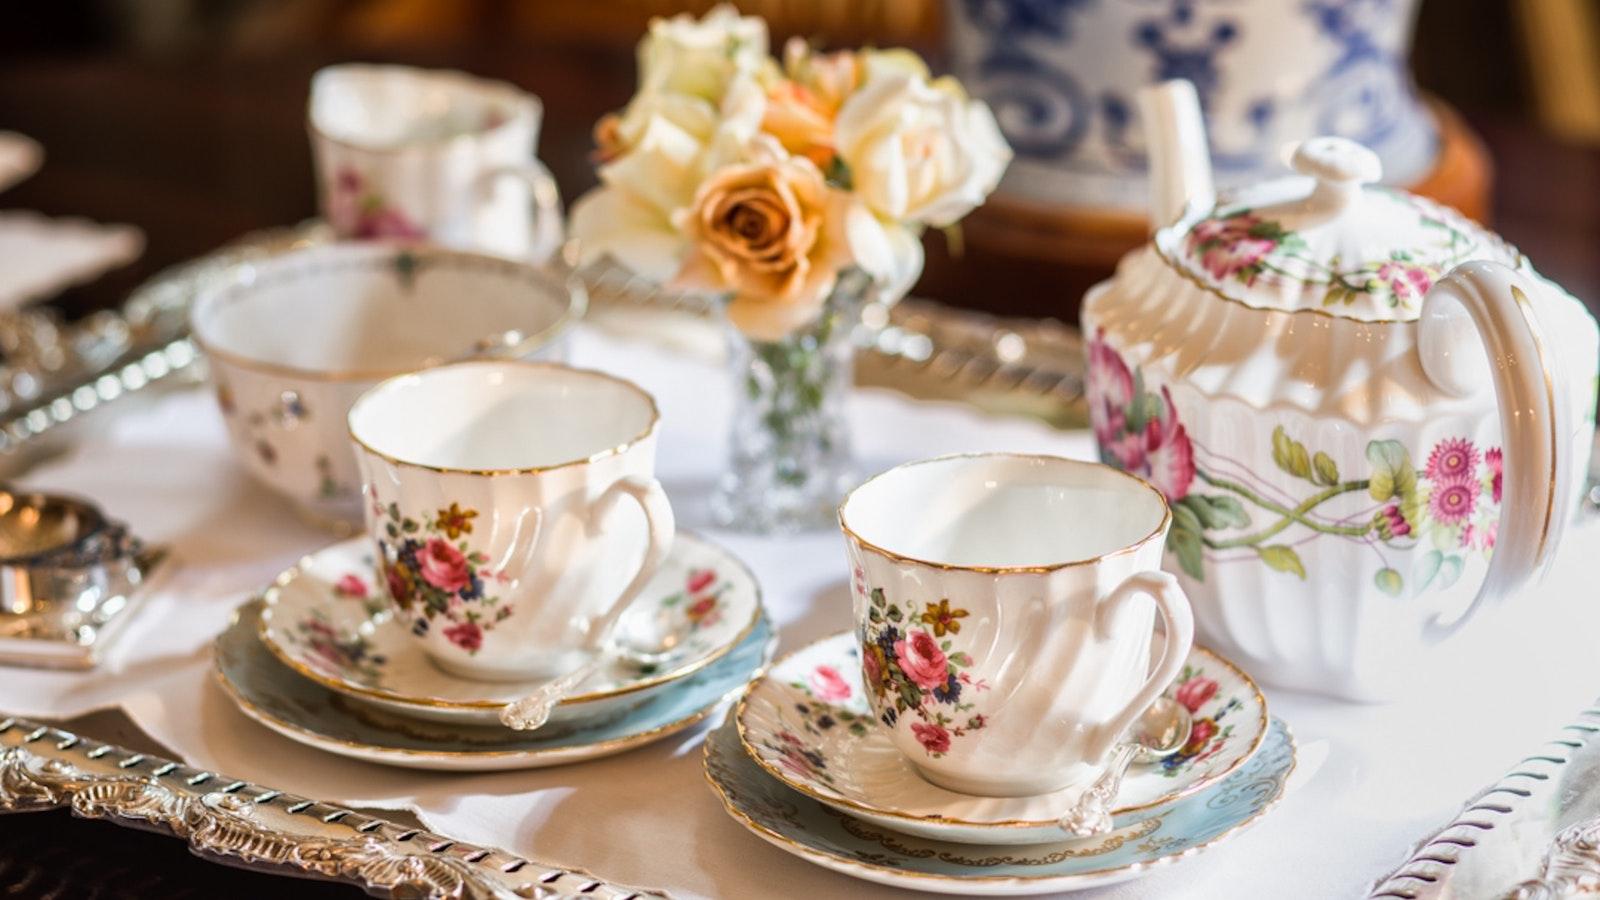 Complimentary afternoon tea at Holyrood